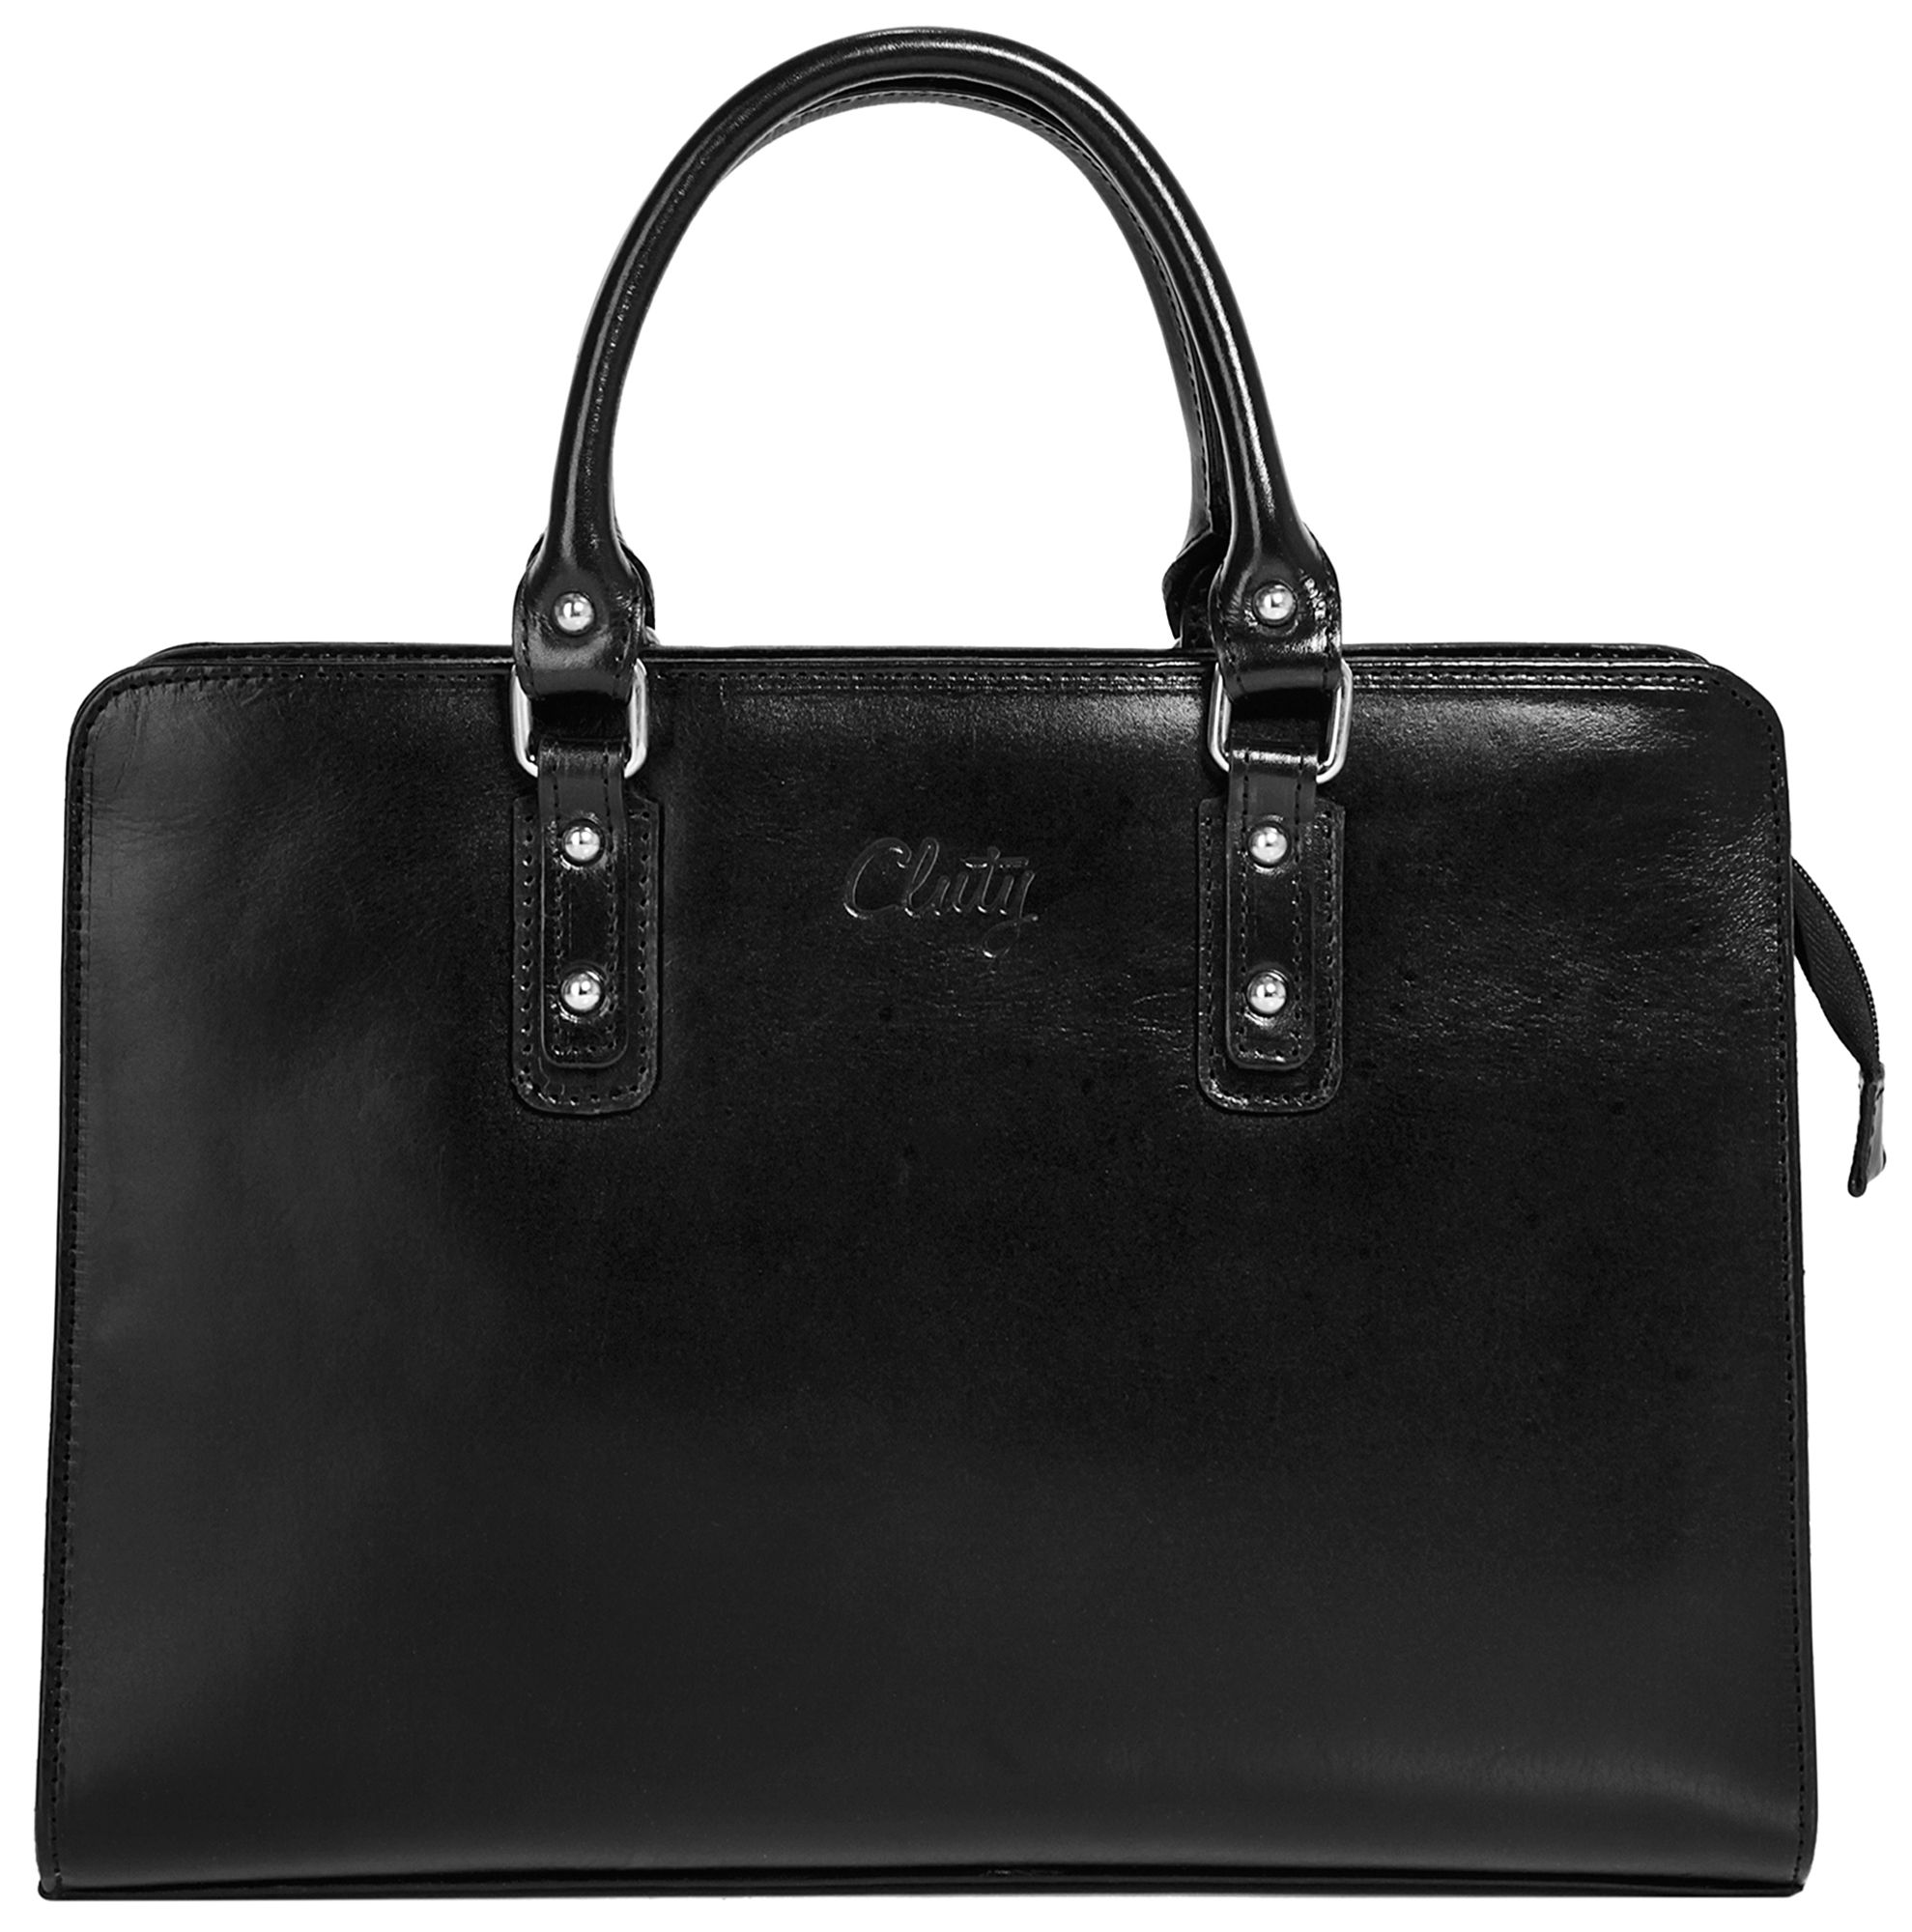 CLUTY Cluty Leder Damen Handtaschen